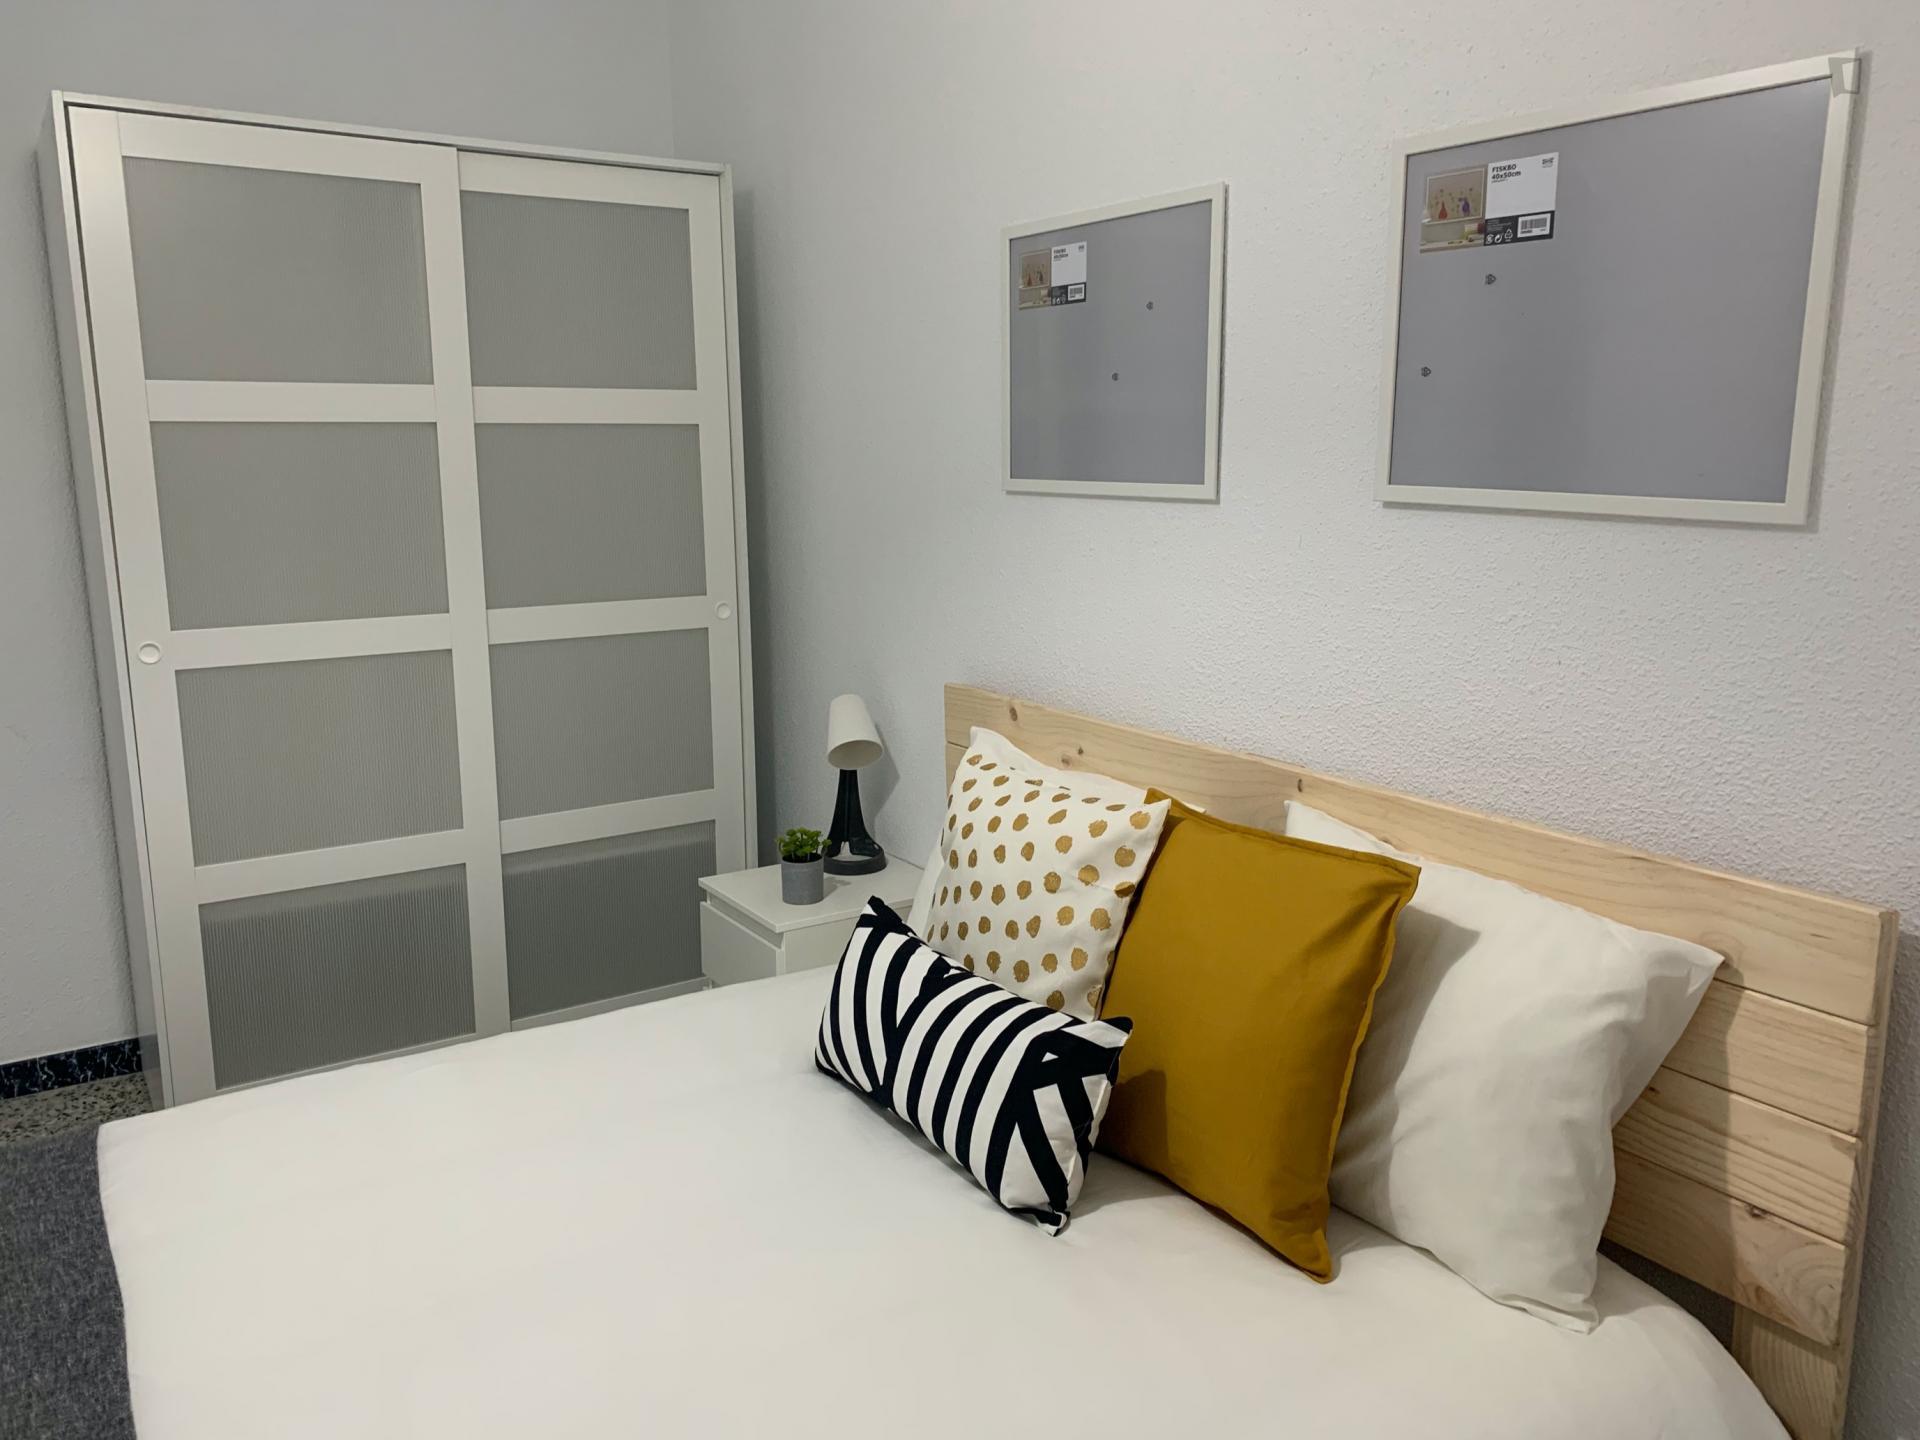 Morant - Double bedroom in a 3-bedroom apartment in Alicante